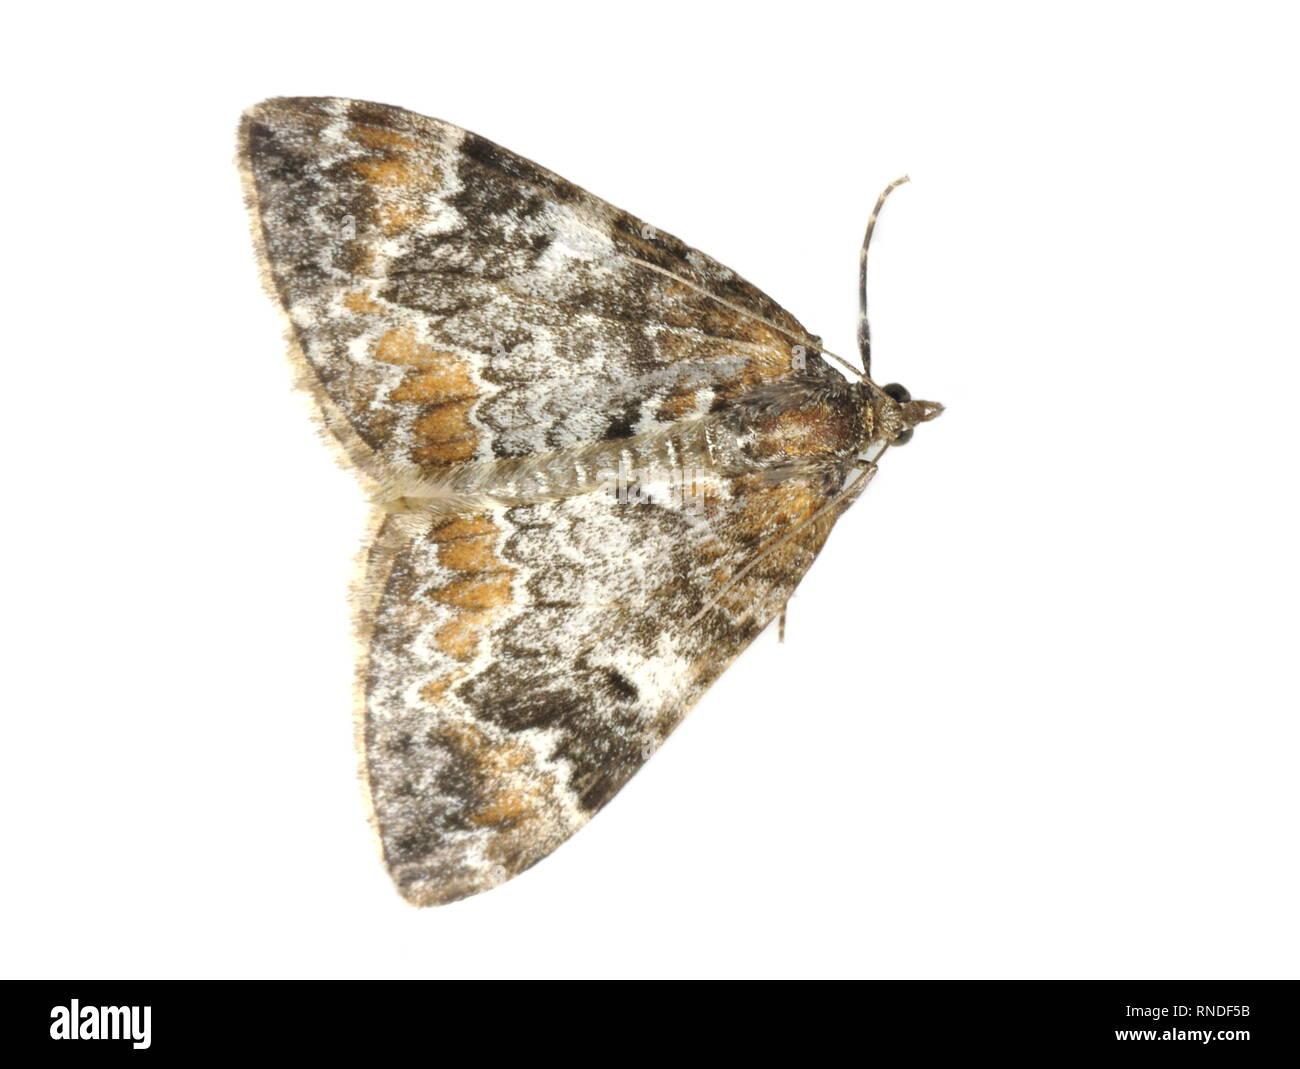 La polilla de la alfombra de mármol oscuro Dysstroma citrata